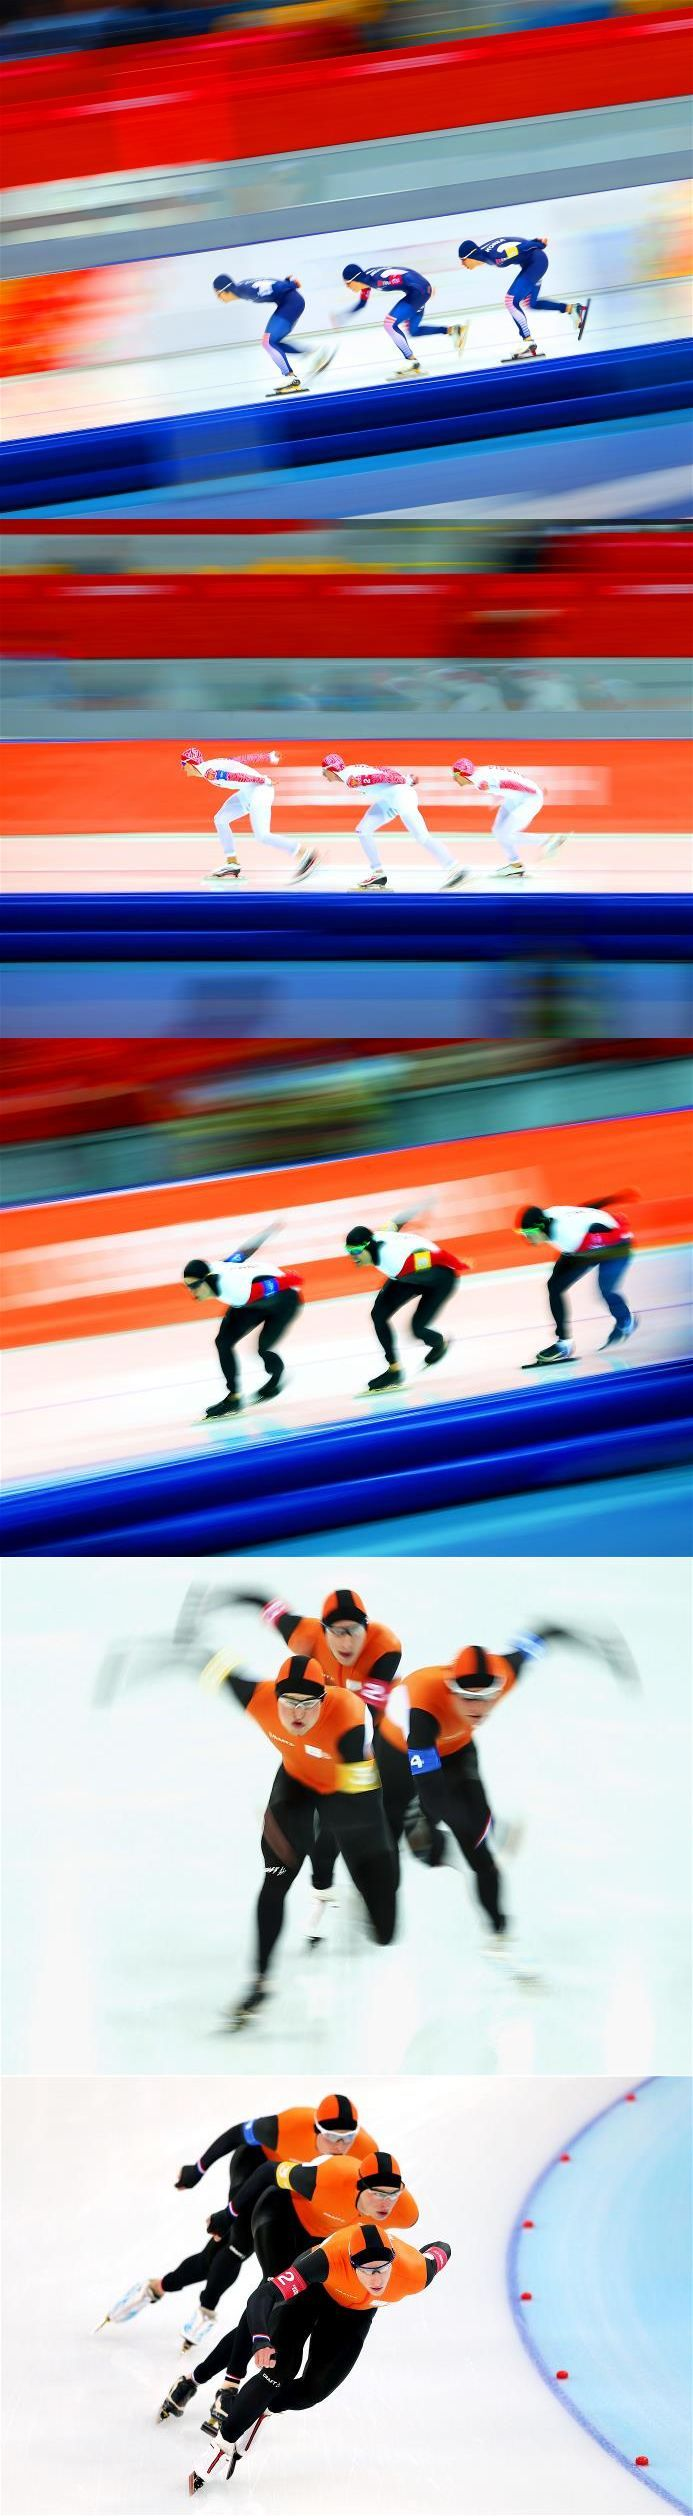 Roller skating rink lafayette in - Speed Skating Men S Team Pursuit Jan Blokhuijsen Sven Kramer And Koen Verweij Of